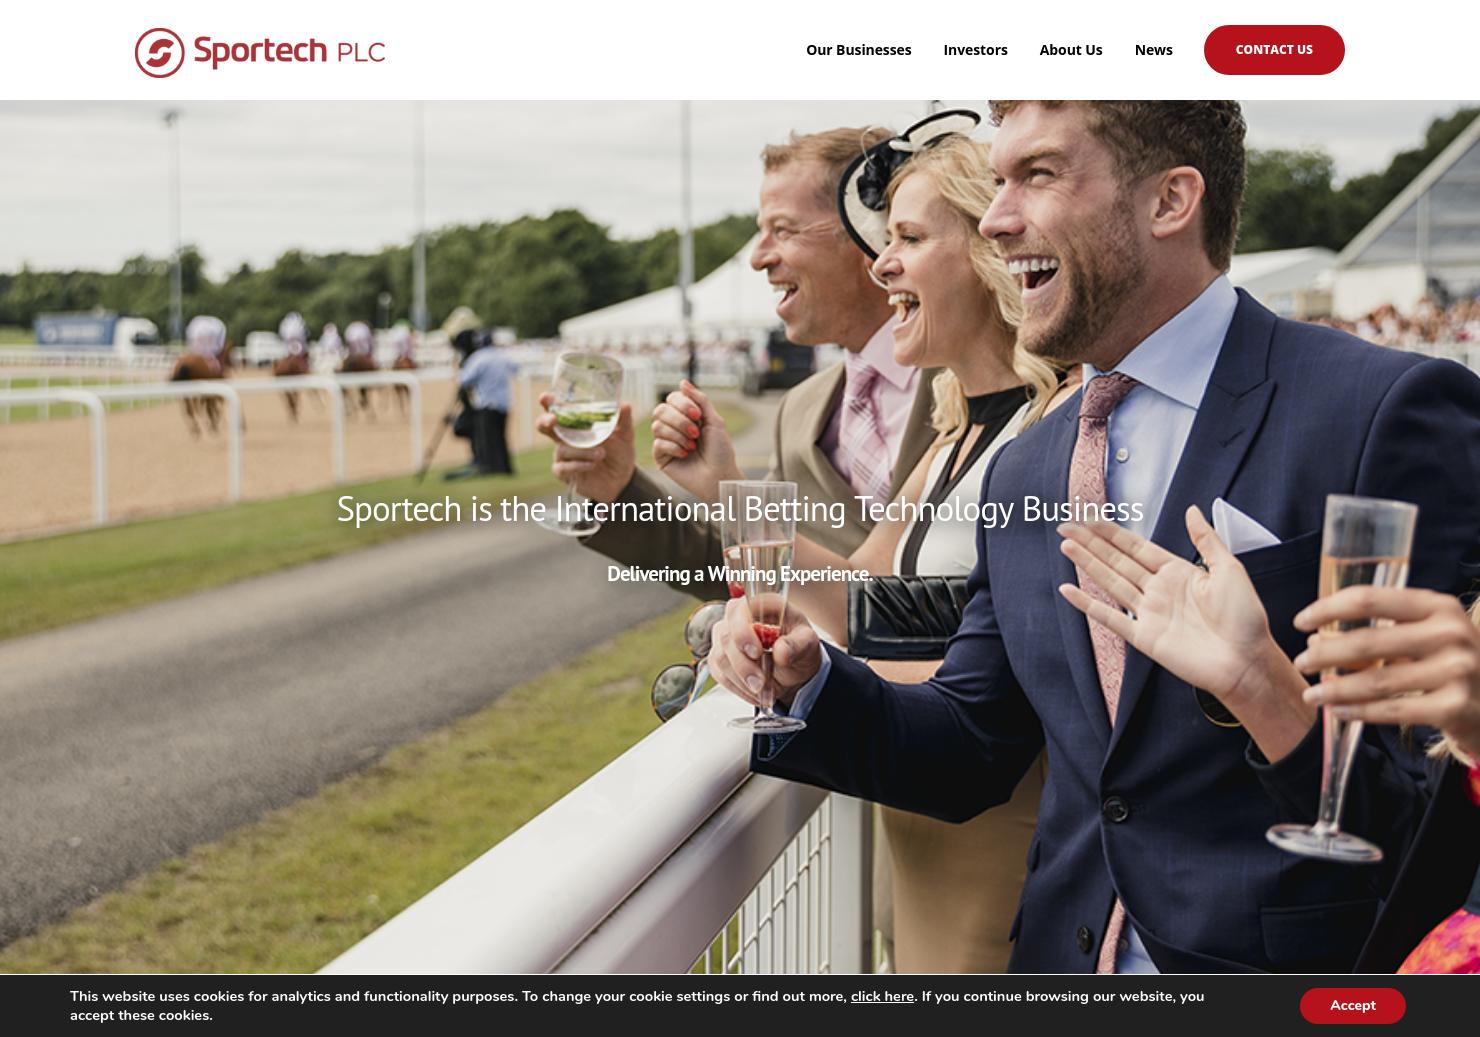 Sportech Home Page